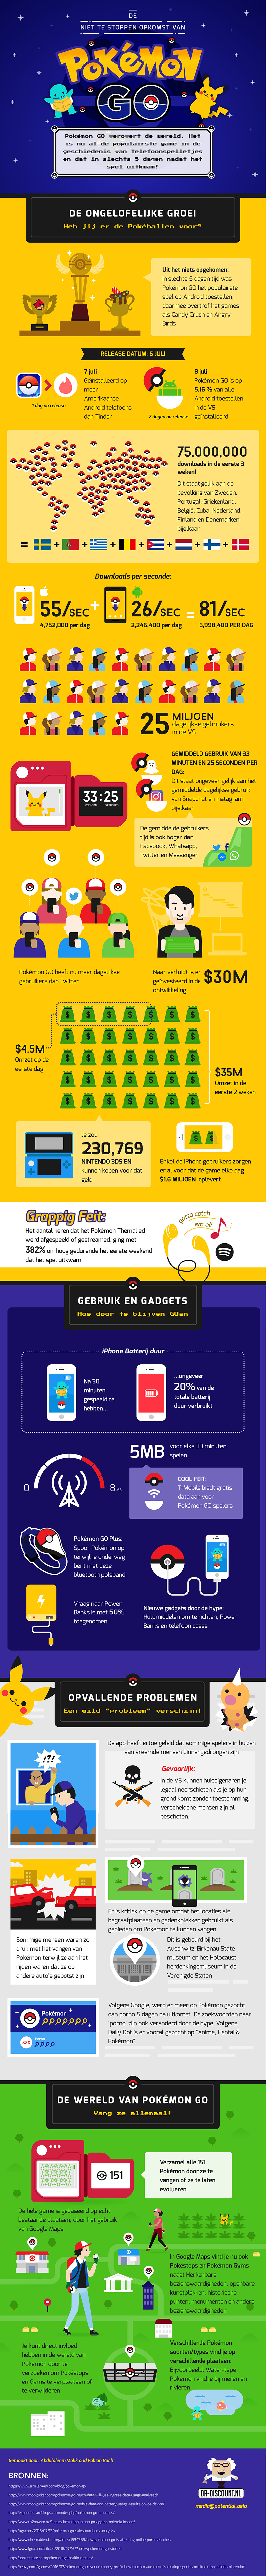 Pokemongo Infographic - dr-discount.nl